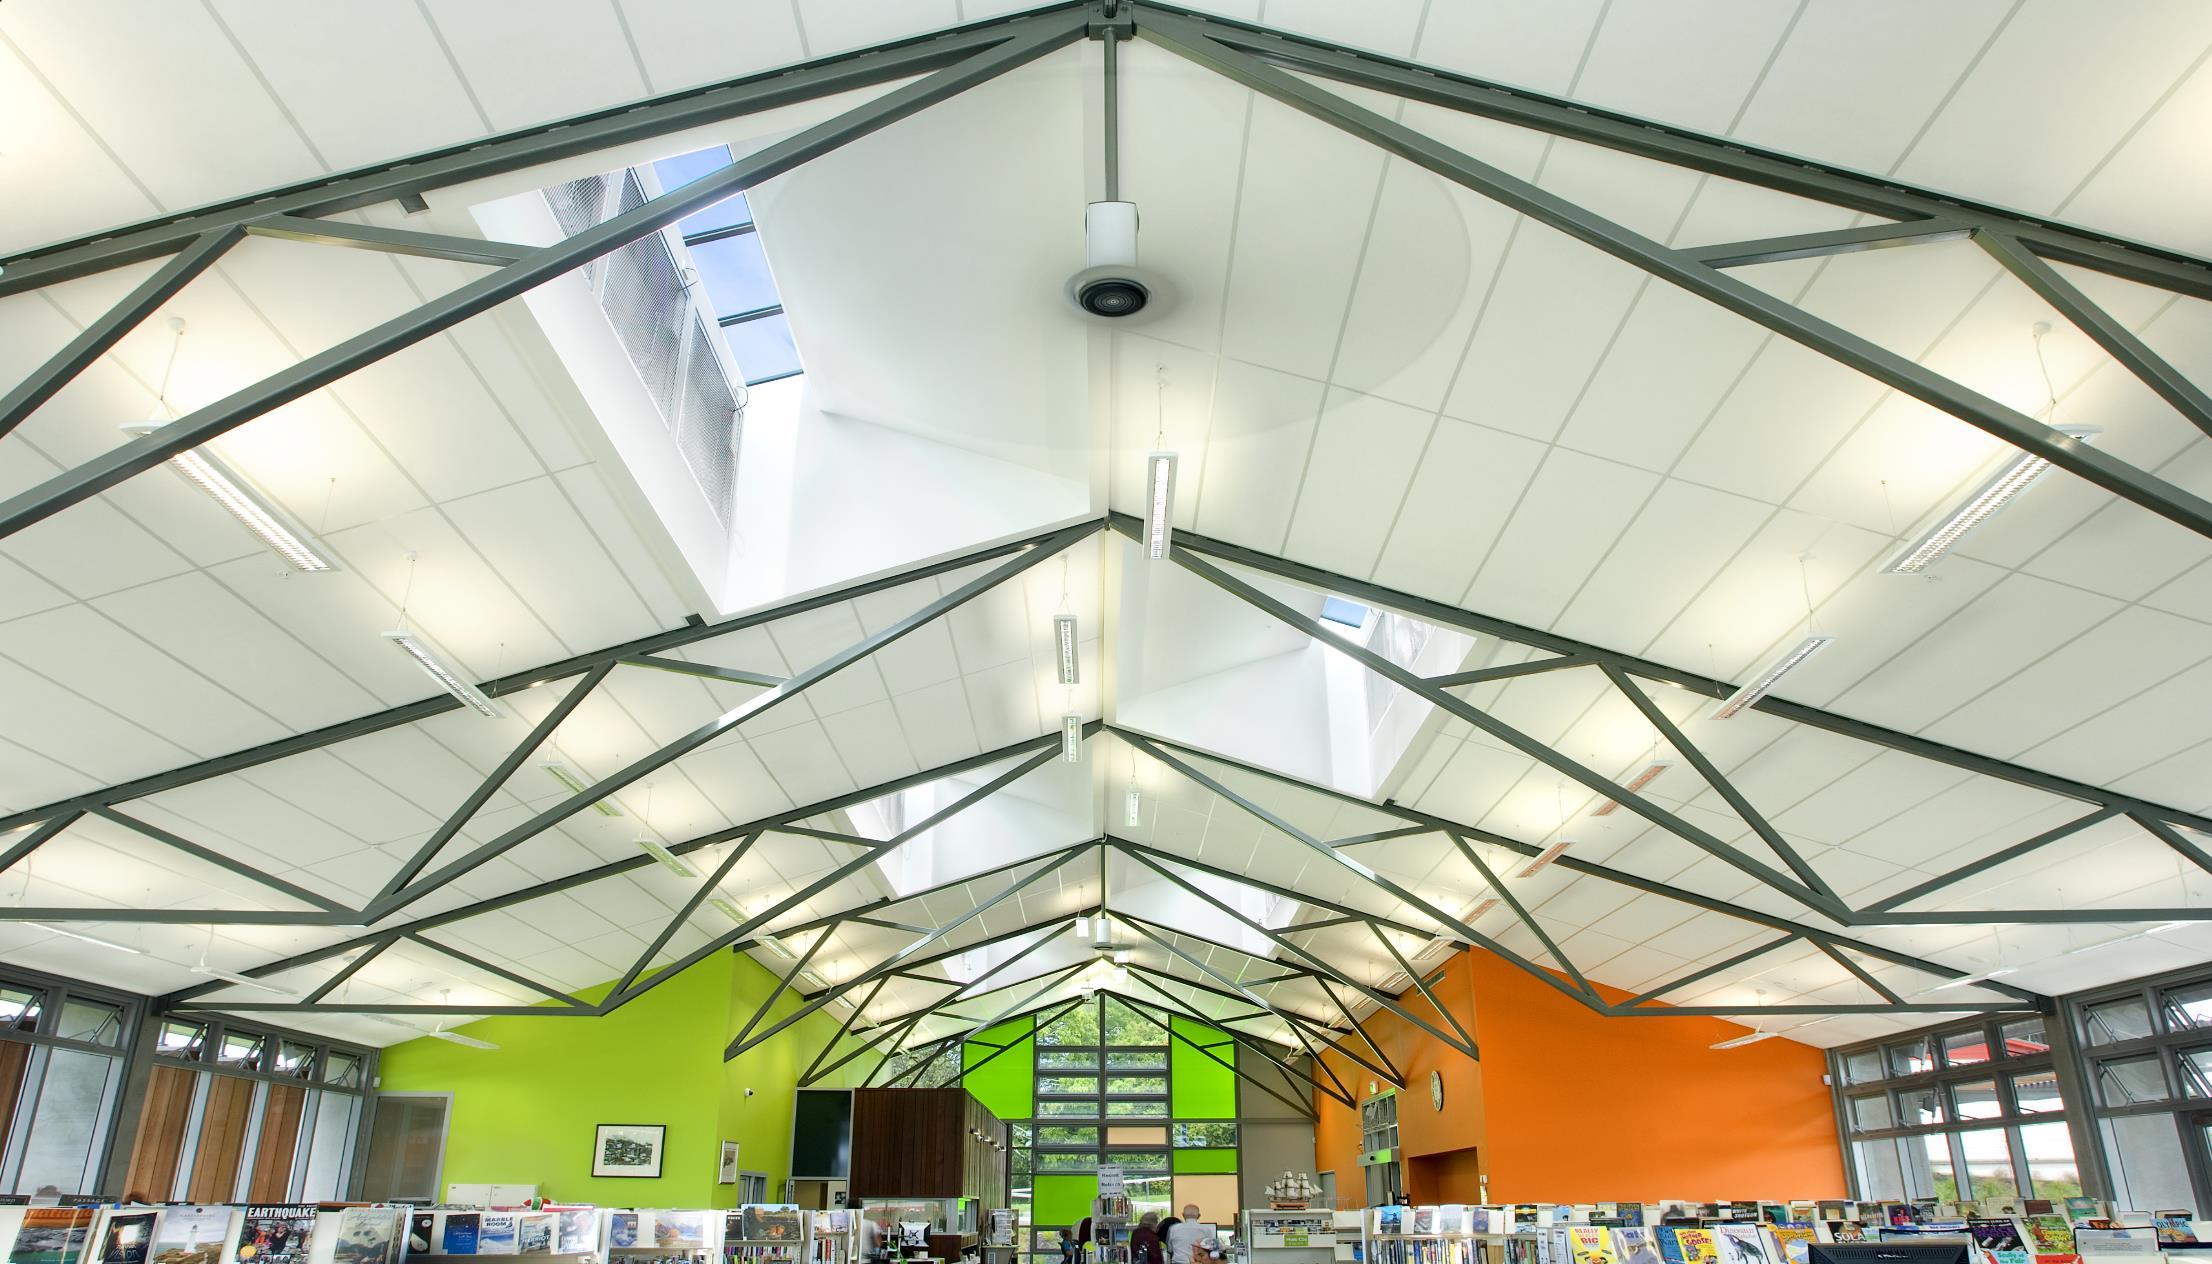 Wellsford Library - Triton 25 plank